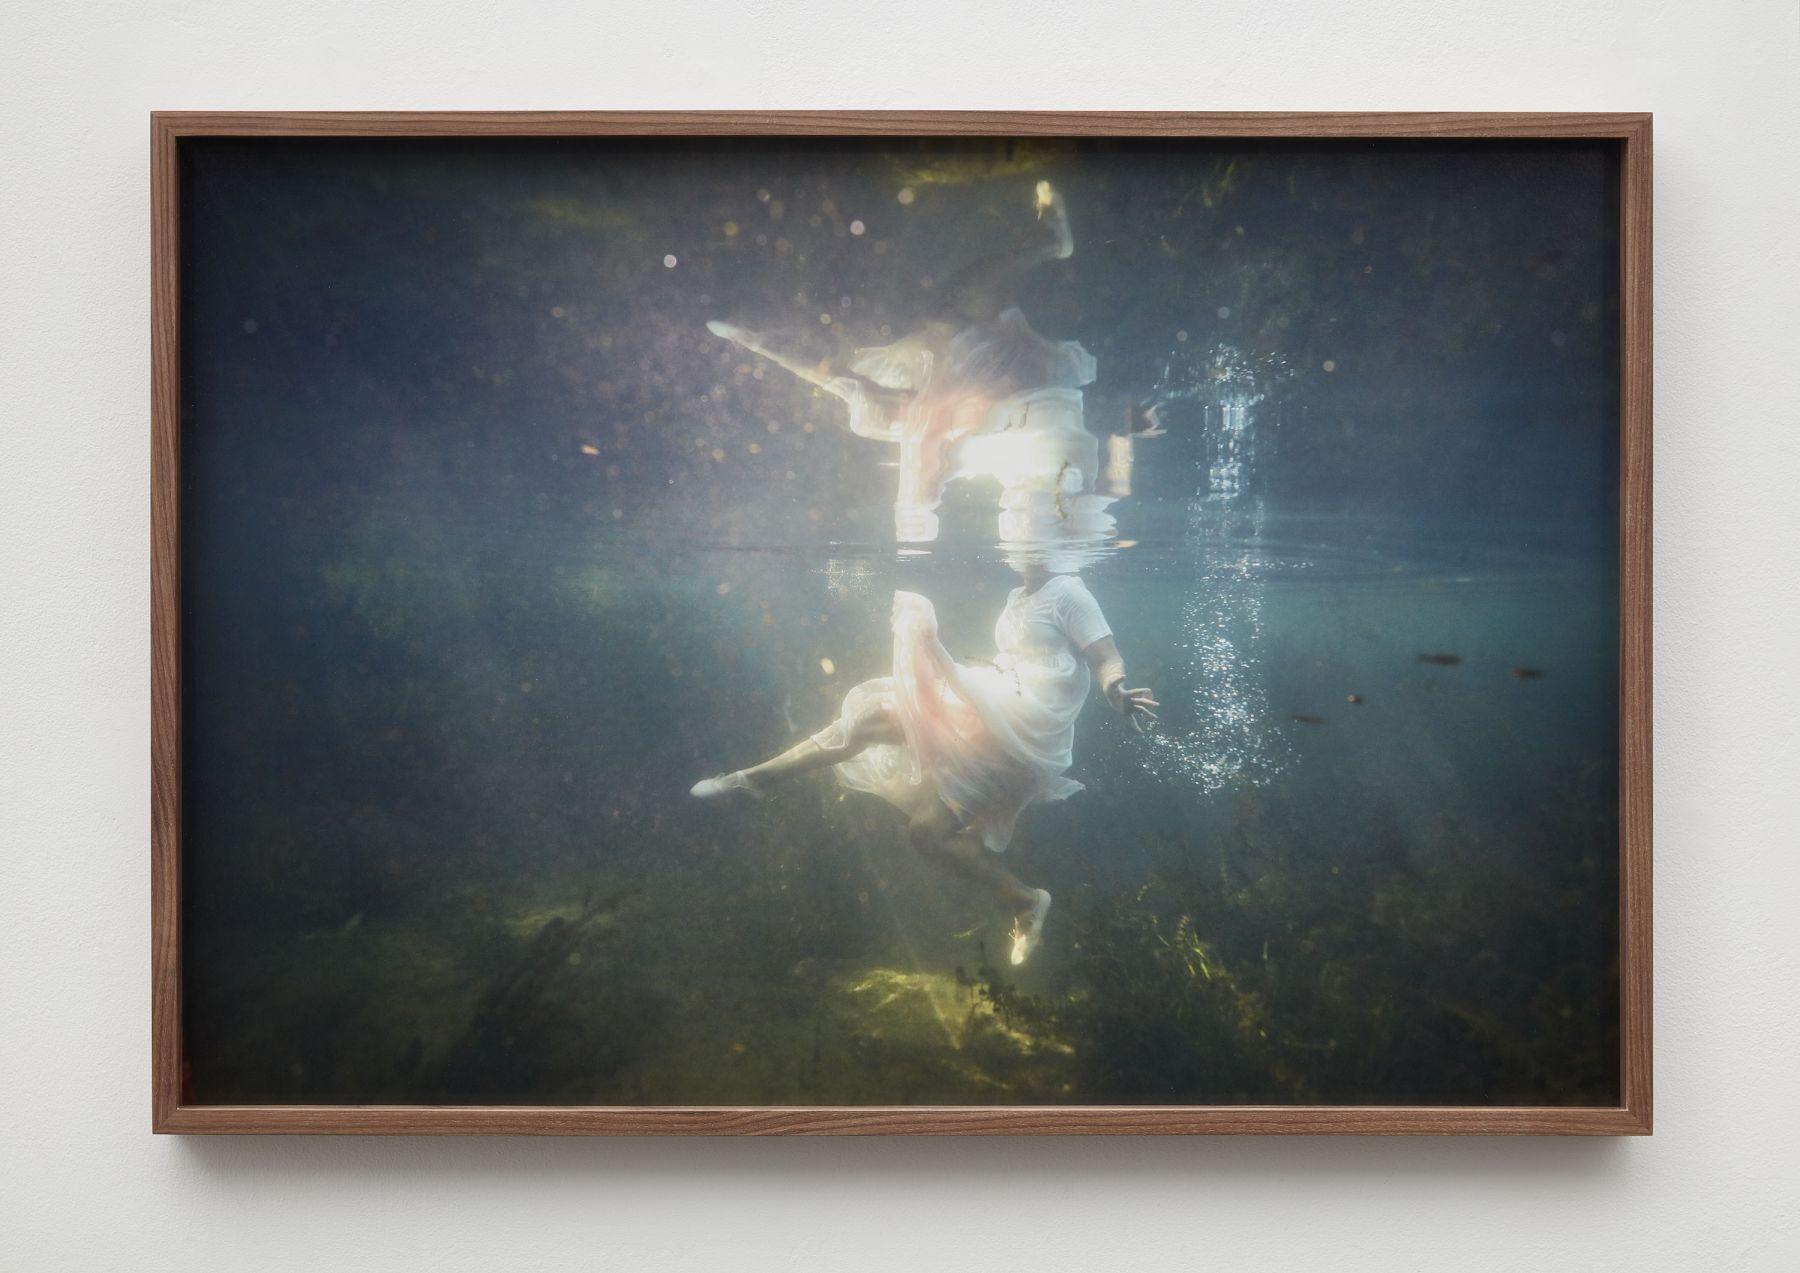 Photograph of figure in white dress underwater by Allison Janae Hamilton